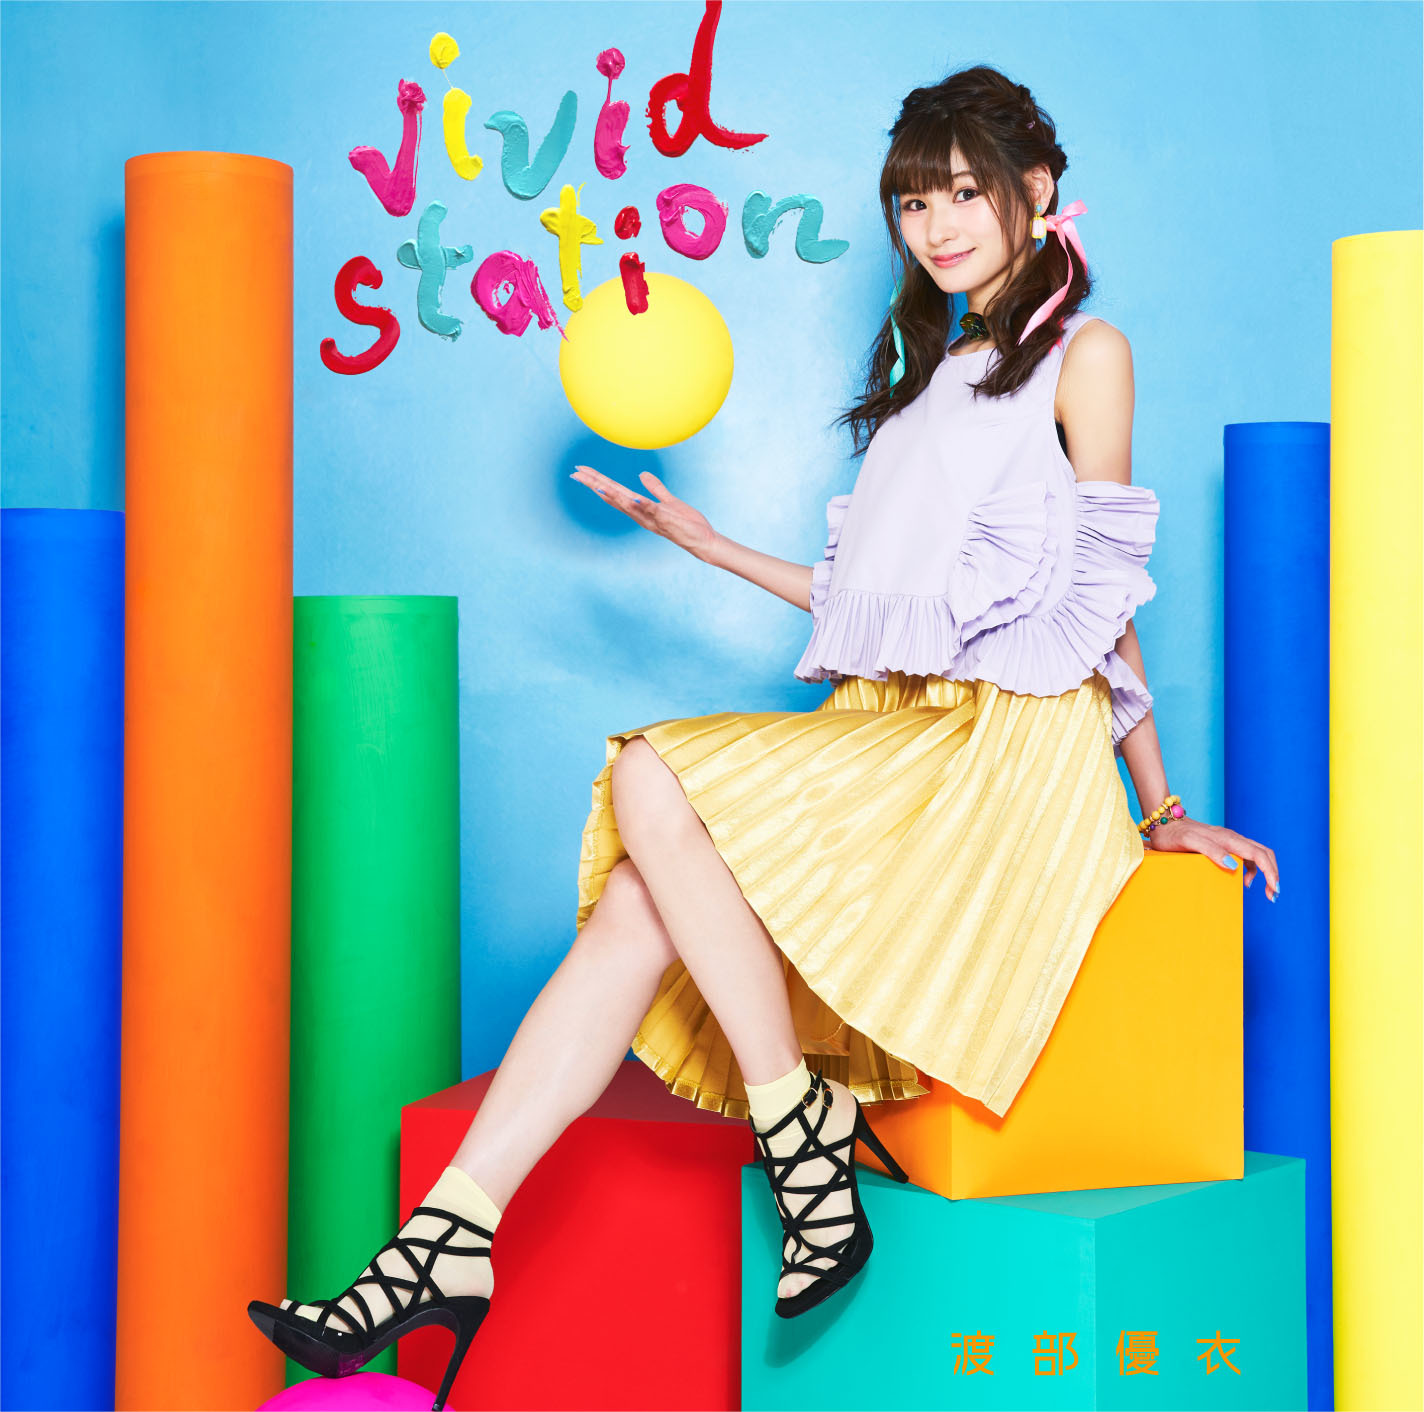 Watanabeyui_vividstation_%e5%88%9d%e5%9b%9e%e9%99%90%e5%ae%9a%e7%9b%a4